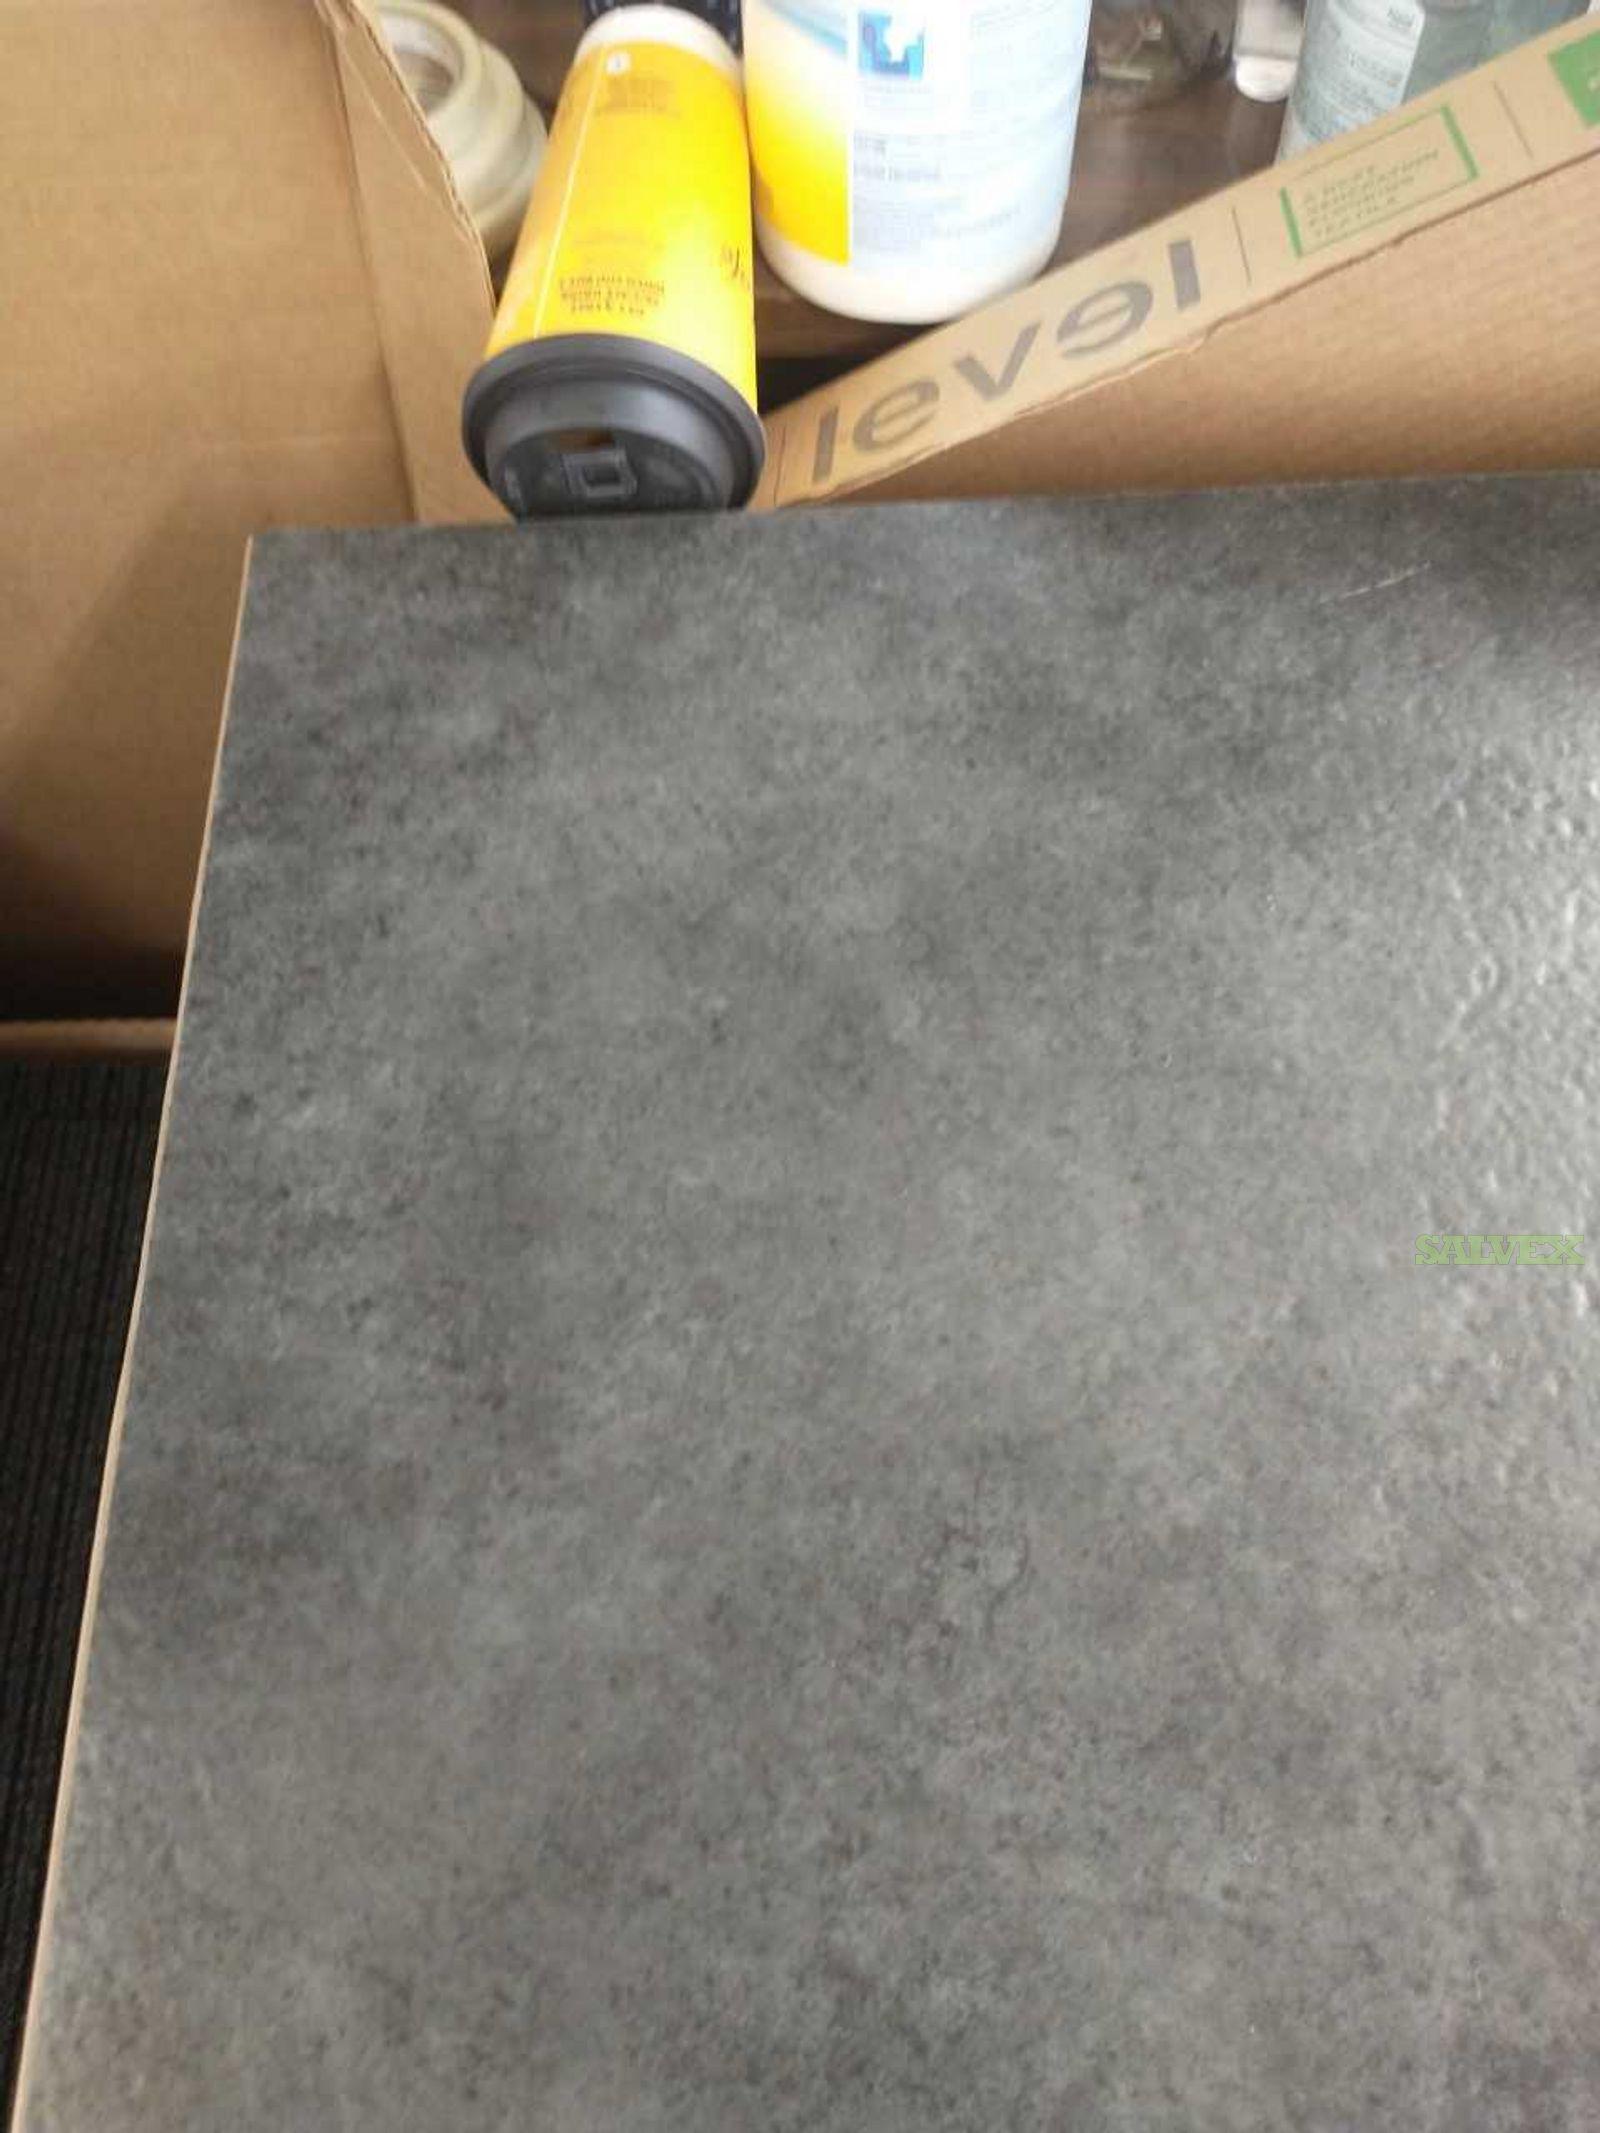 Tandus/Centiva/Tarkett Super commercial lvp 3.04 millimeter thick